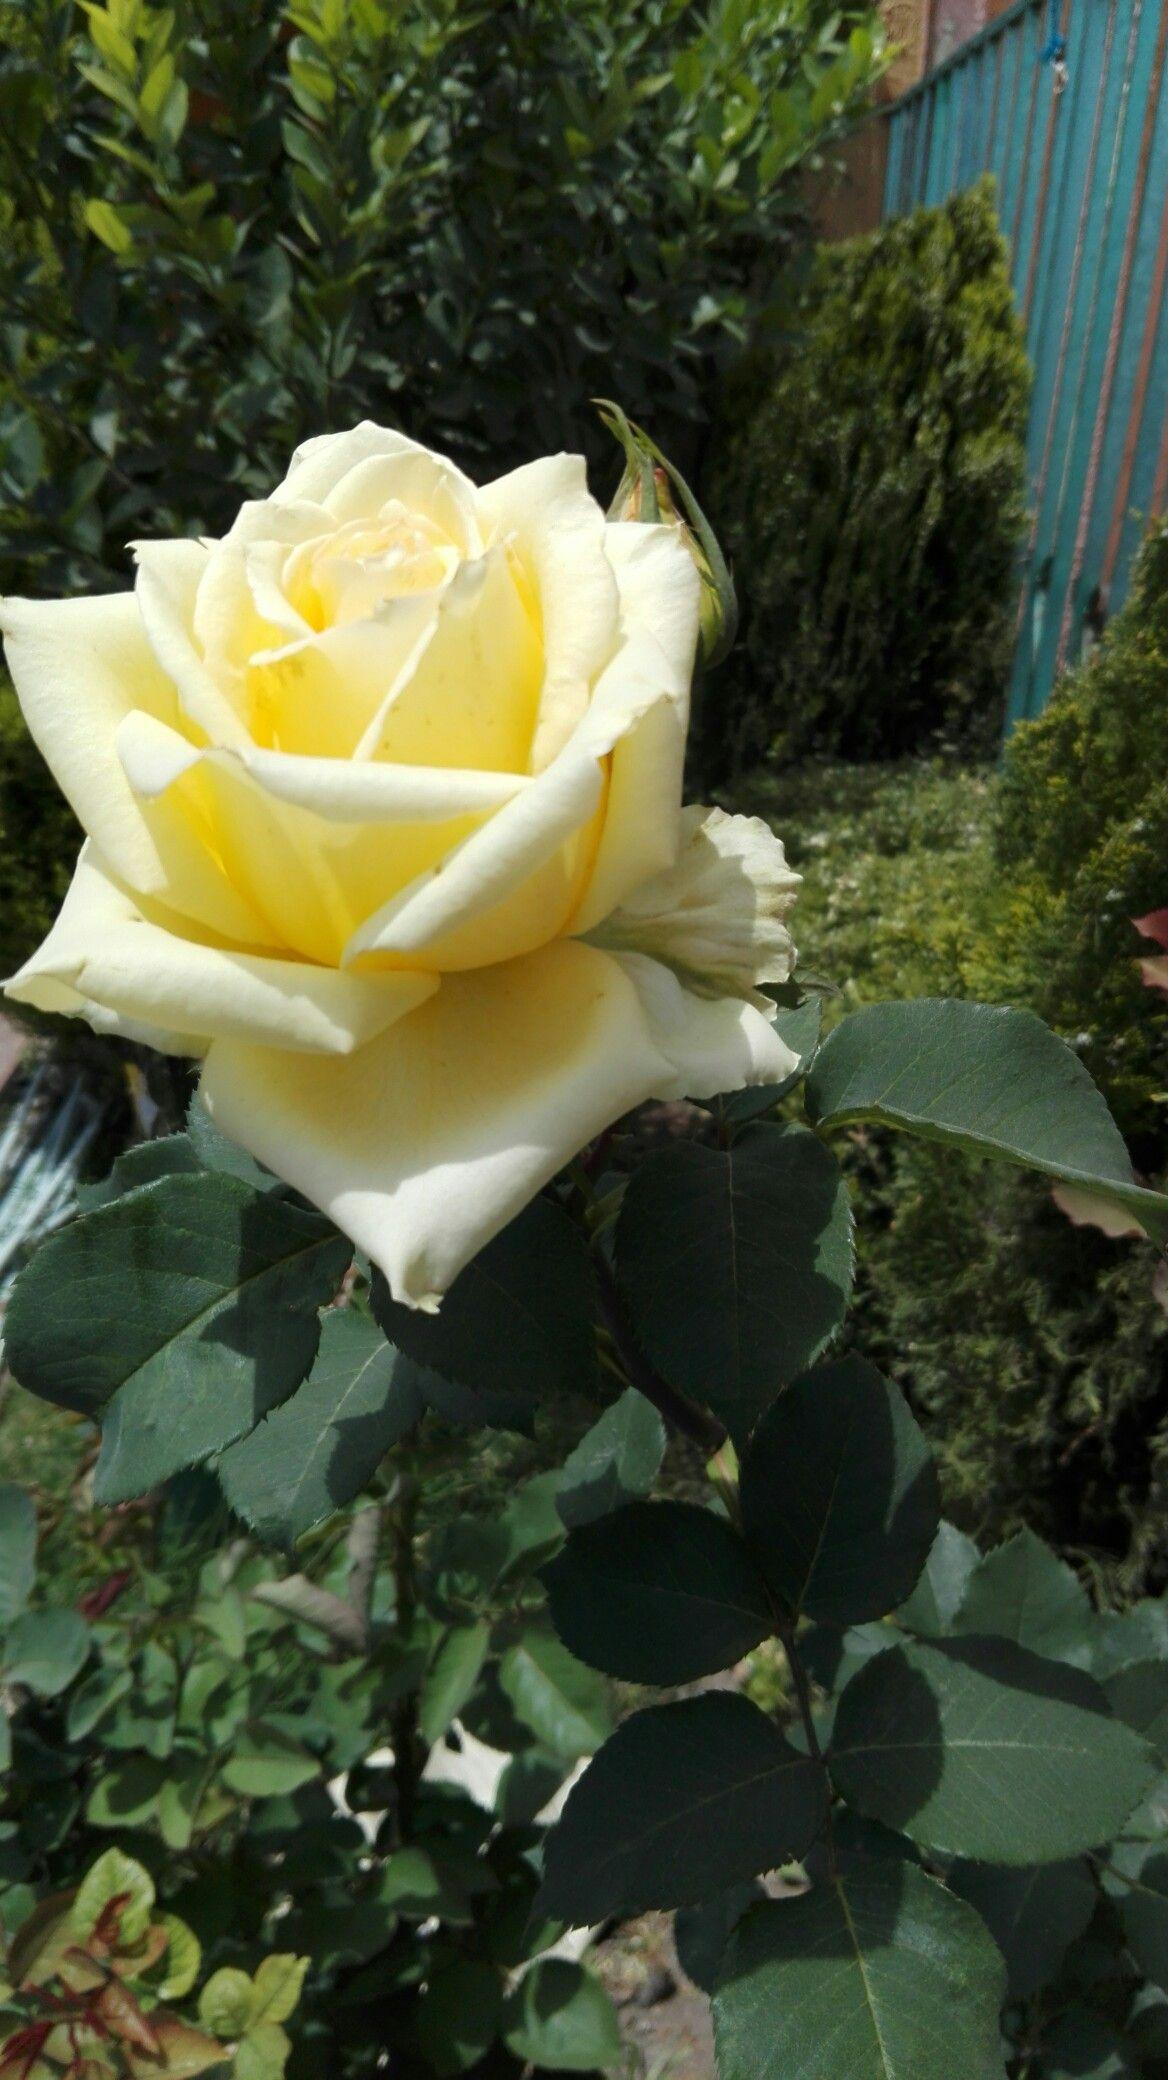 Rosa muñ